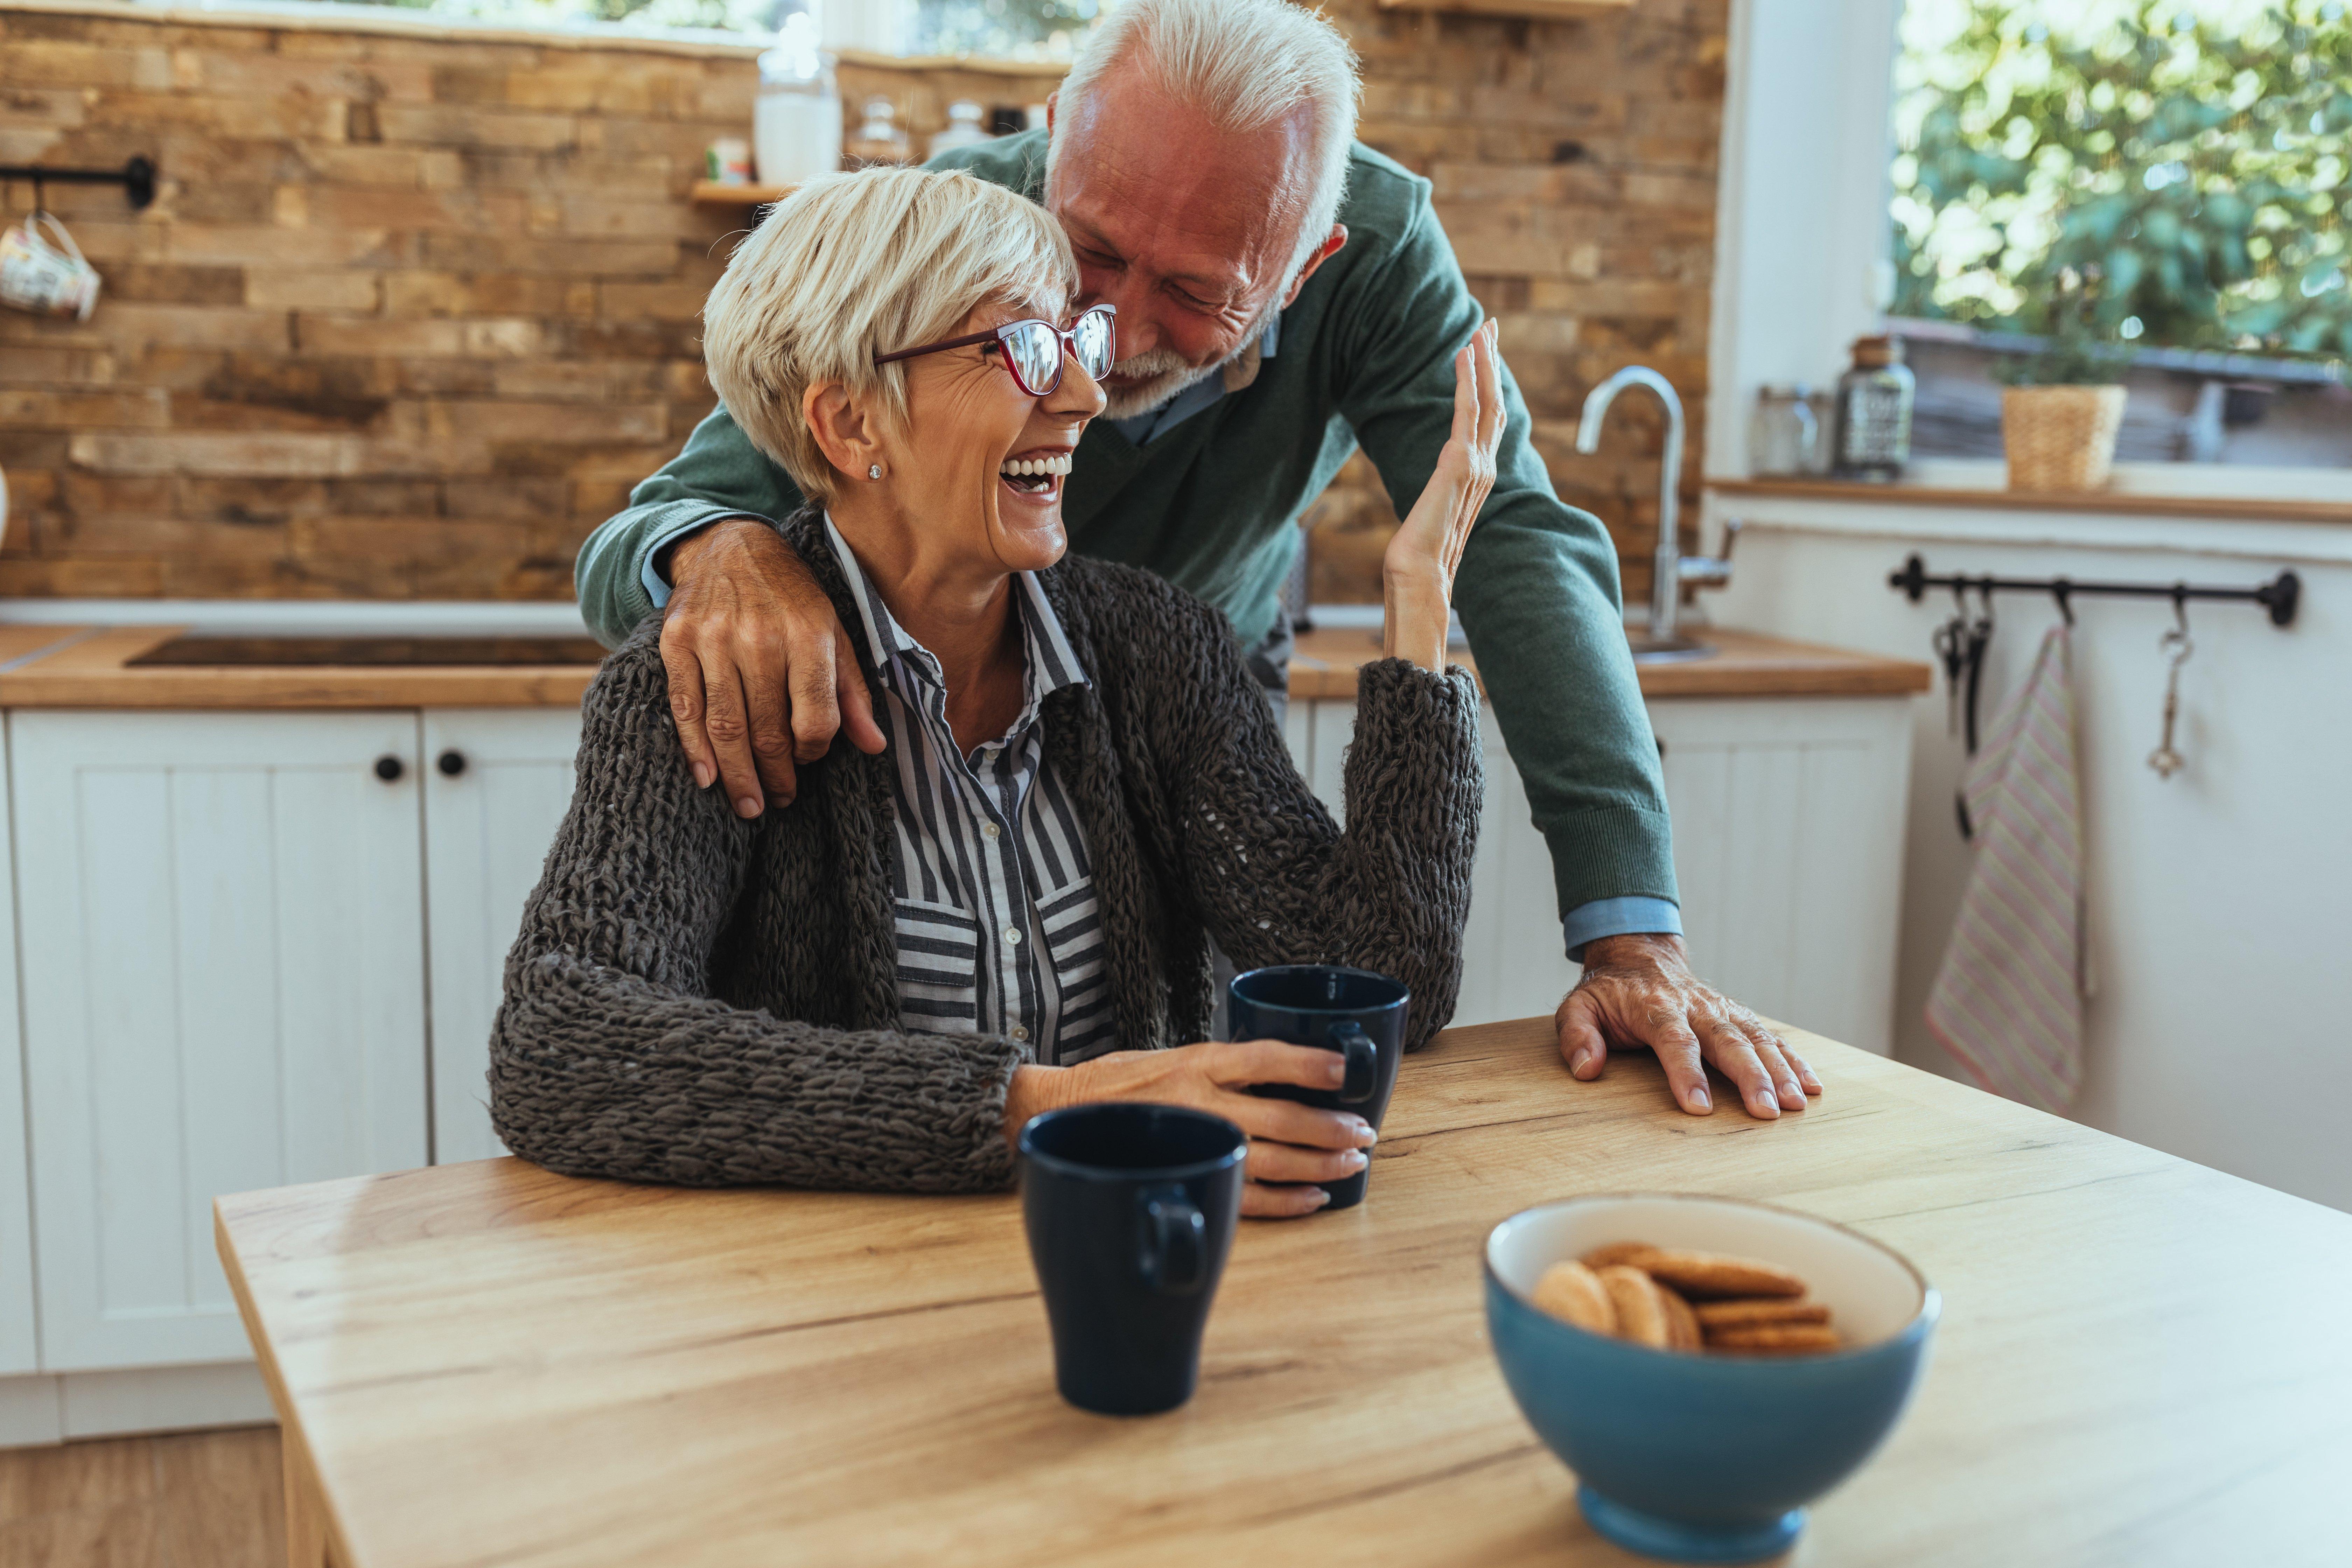 Älteres Paar in Küche | Quelle: Shutterstock